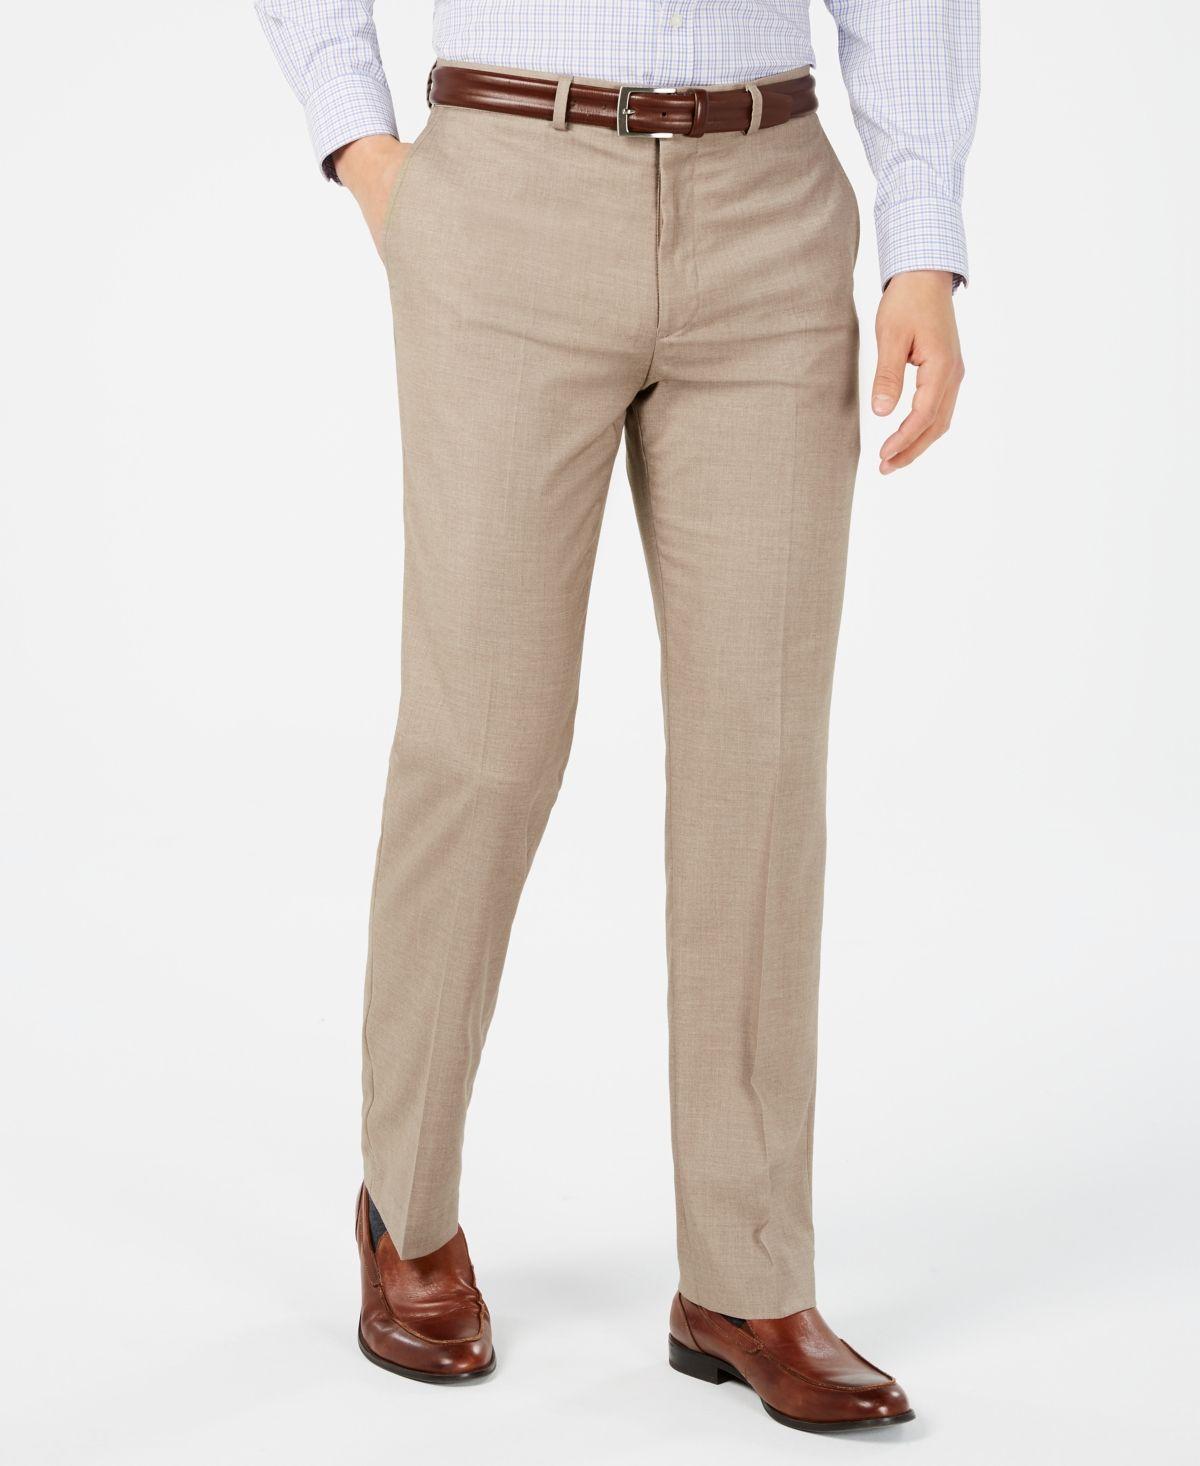 Dockers Men S Slim Fit Performance Stretch Solid Dress Pants Reviews Pants Men Macy S In 2021 Mens Casual Outfits Summer Slim Fit Men Dress Pants [ 1466 x 1200 Pixel ]